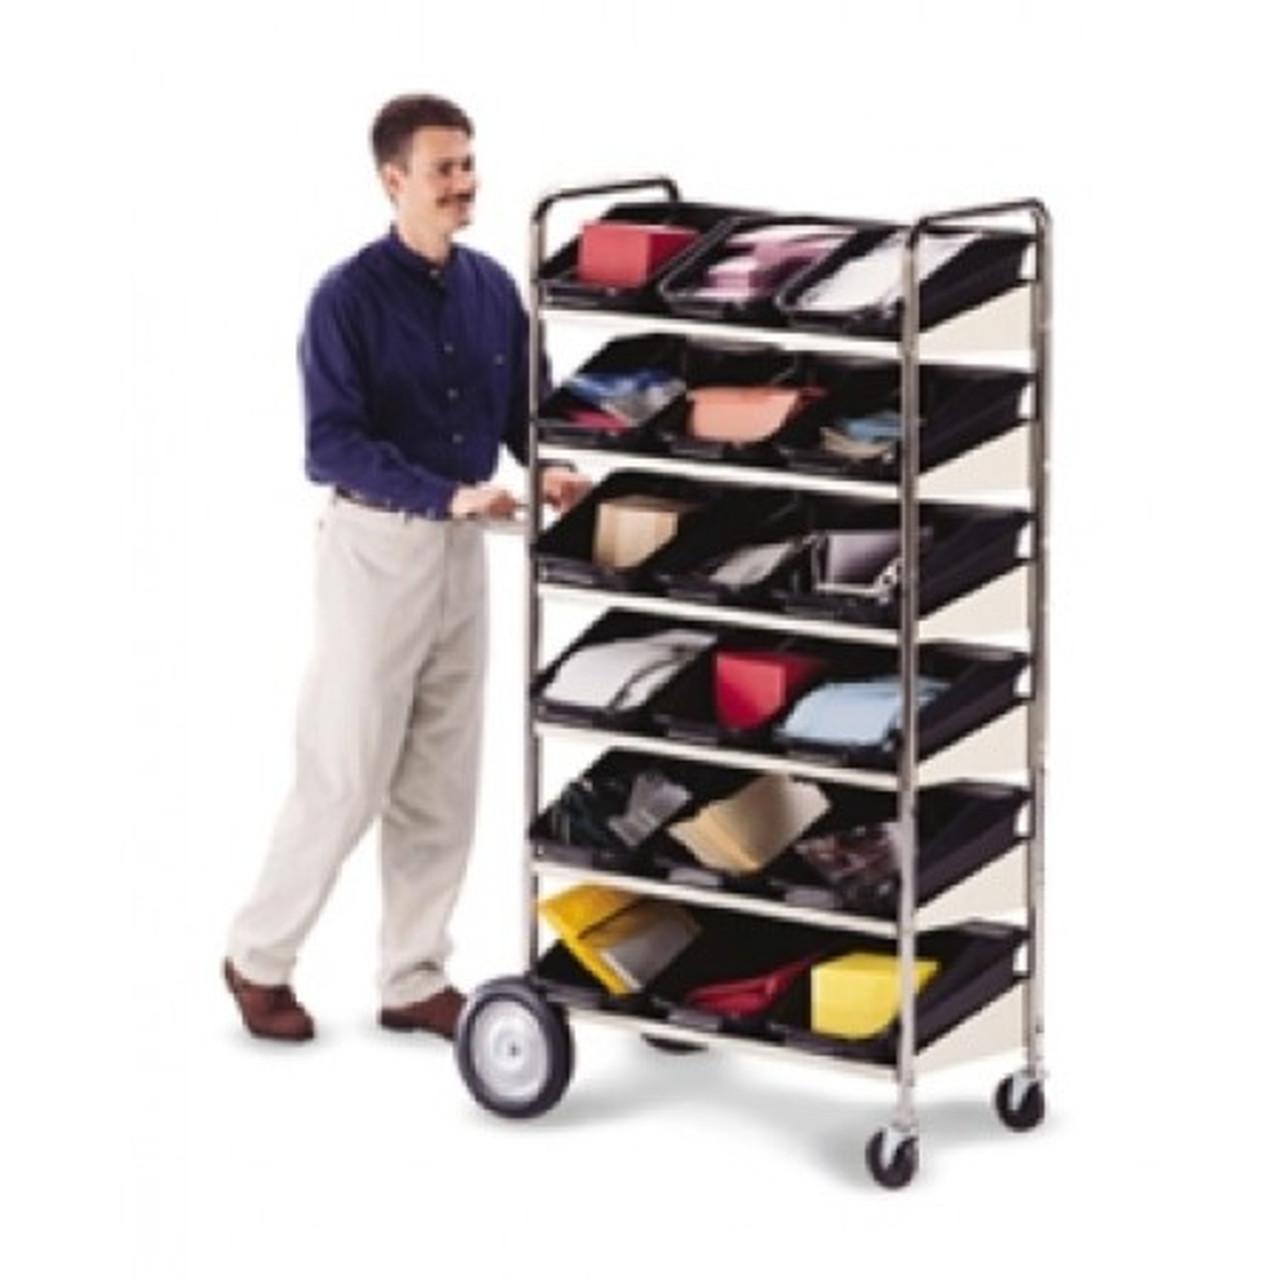 Charnstrom Carts Six Shelf Mobile Bin Mail Distribution Cart